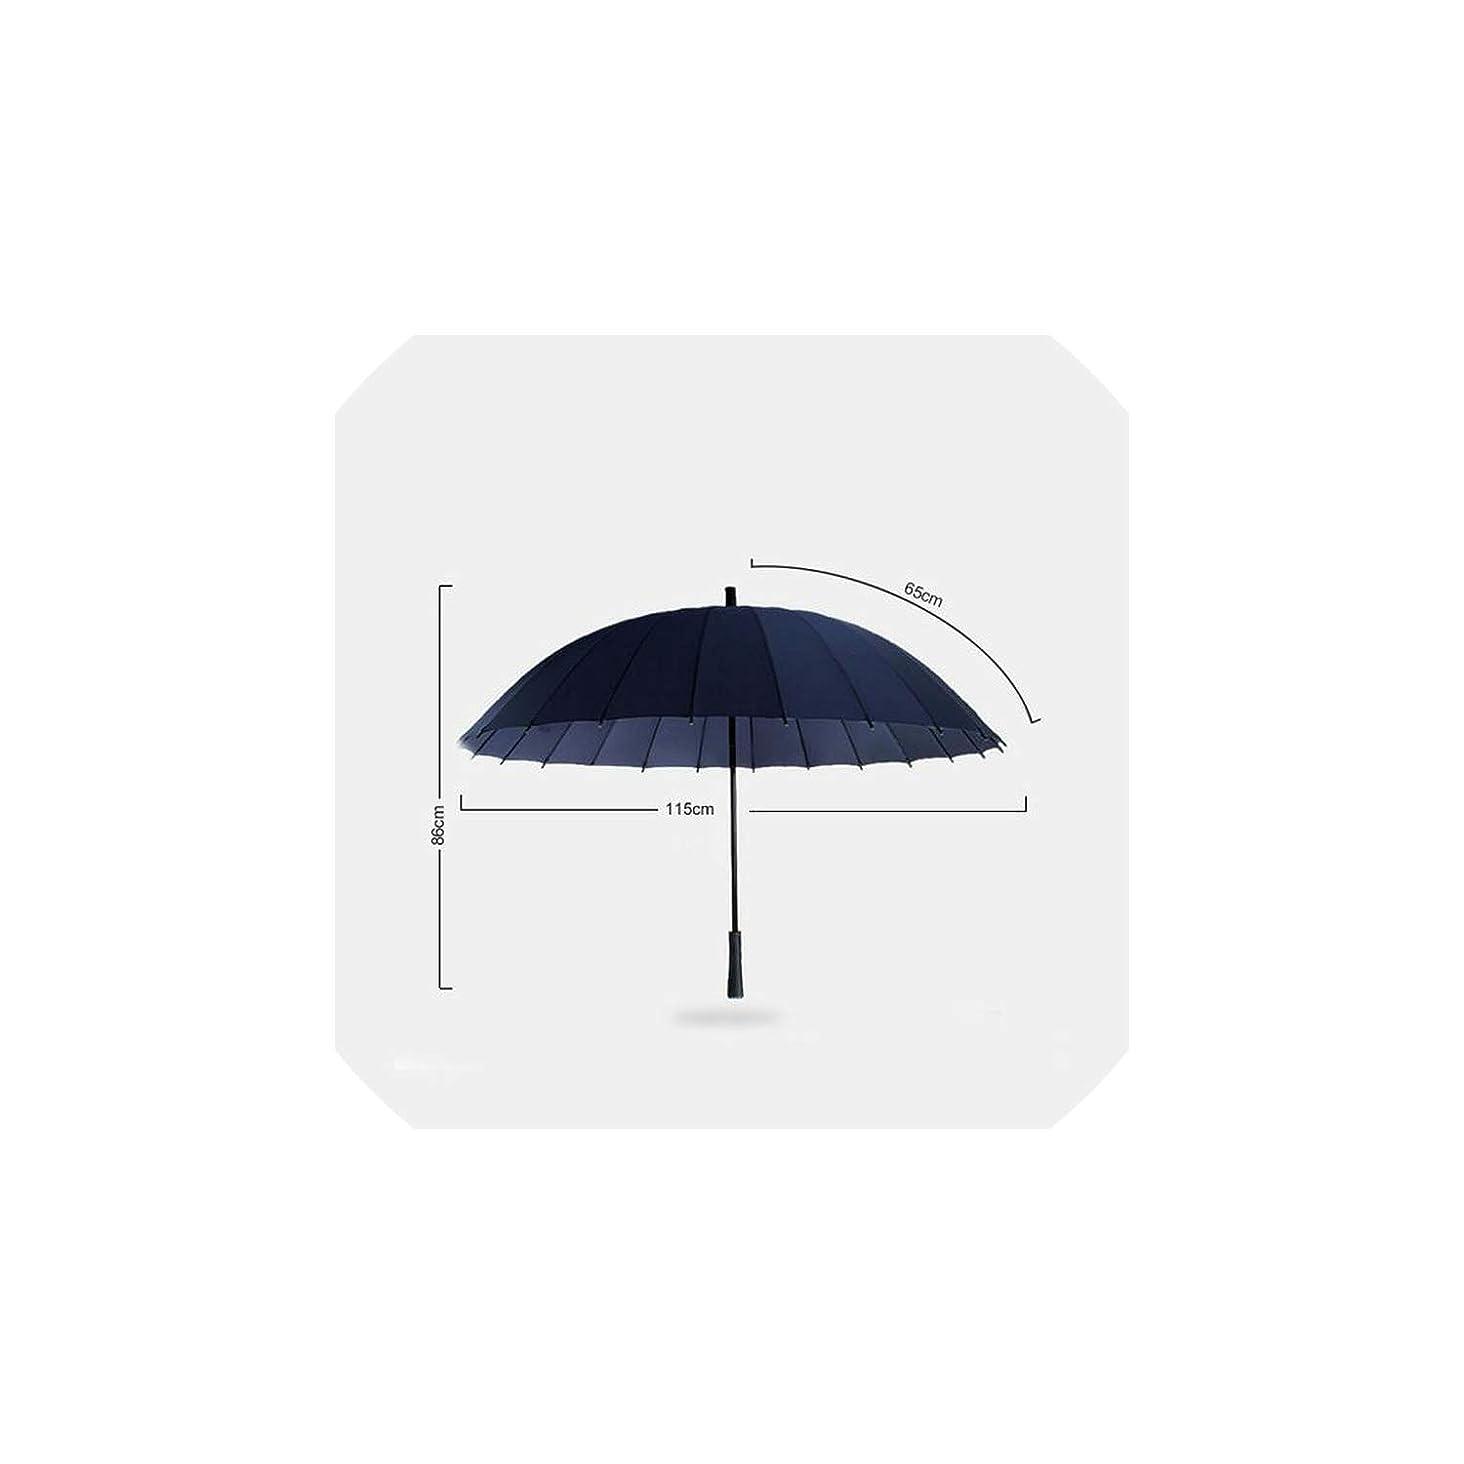 Rain Umbrella 24K Strong Windproof Glassfiber Frame Long Handle Umbrella Women Parasol P2XKL6073001YW,P2XKL6073001YW